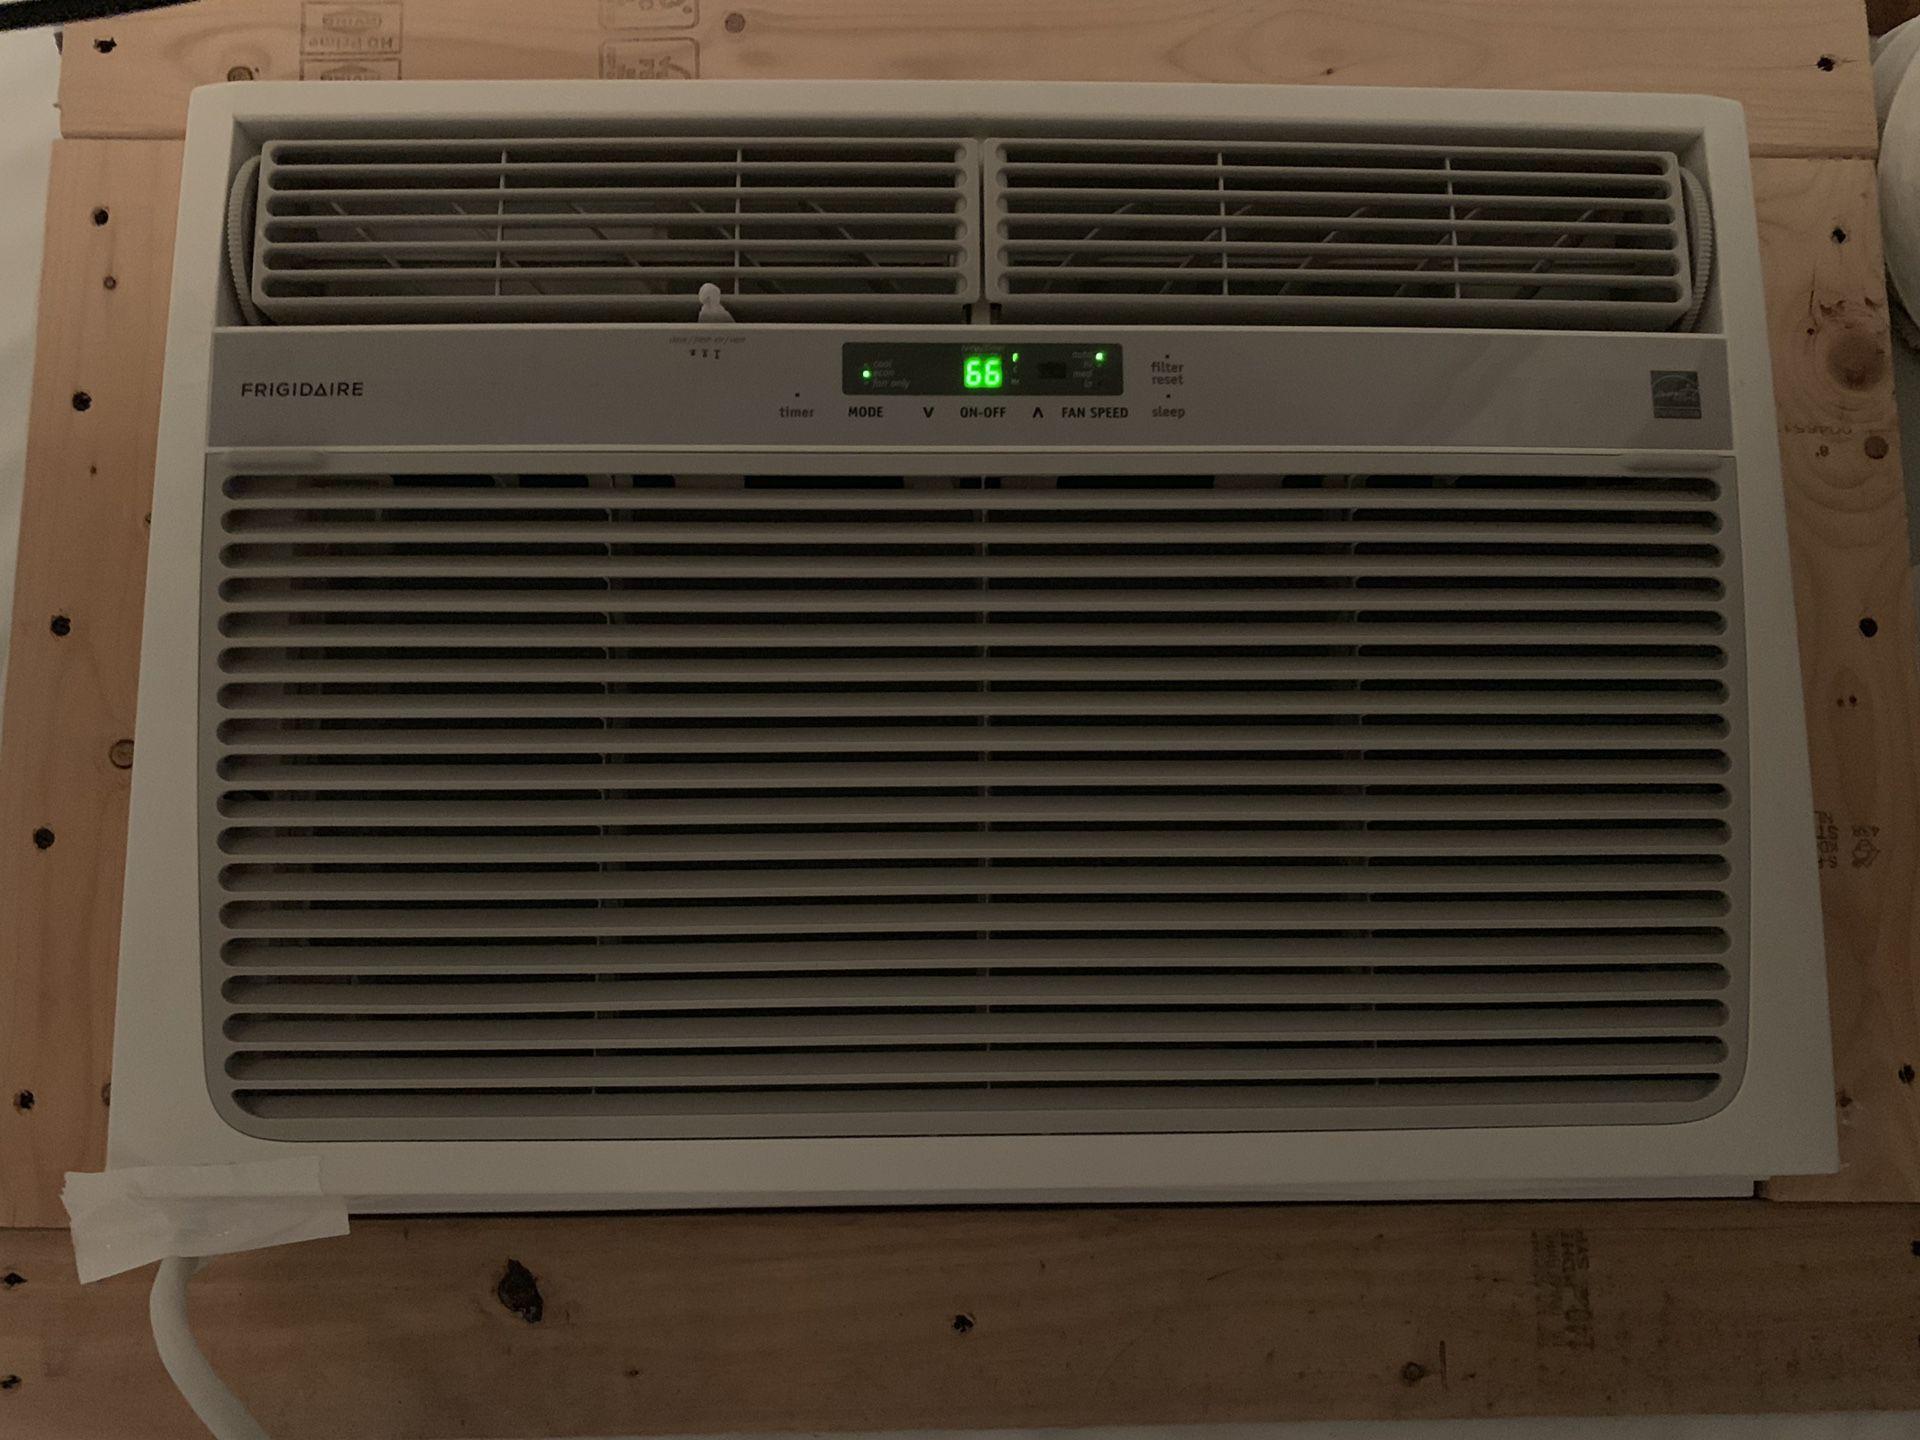 25k btu Frigidaire air conditioner